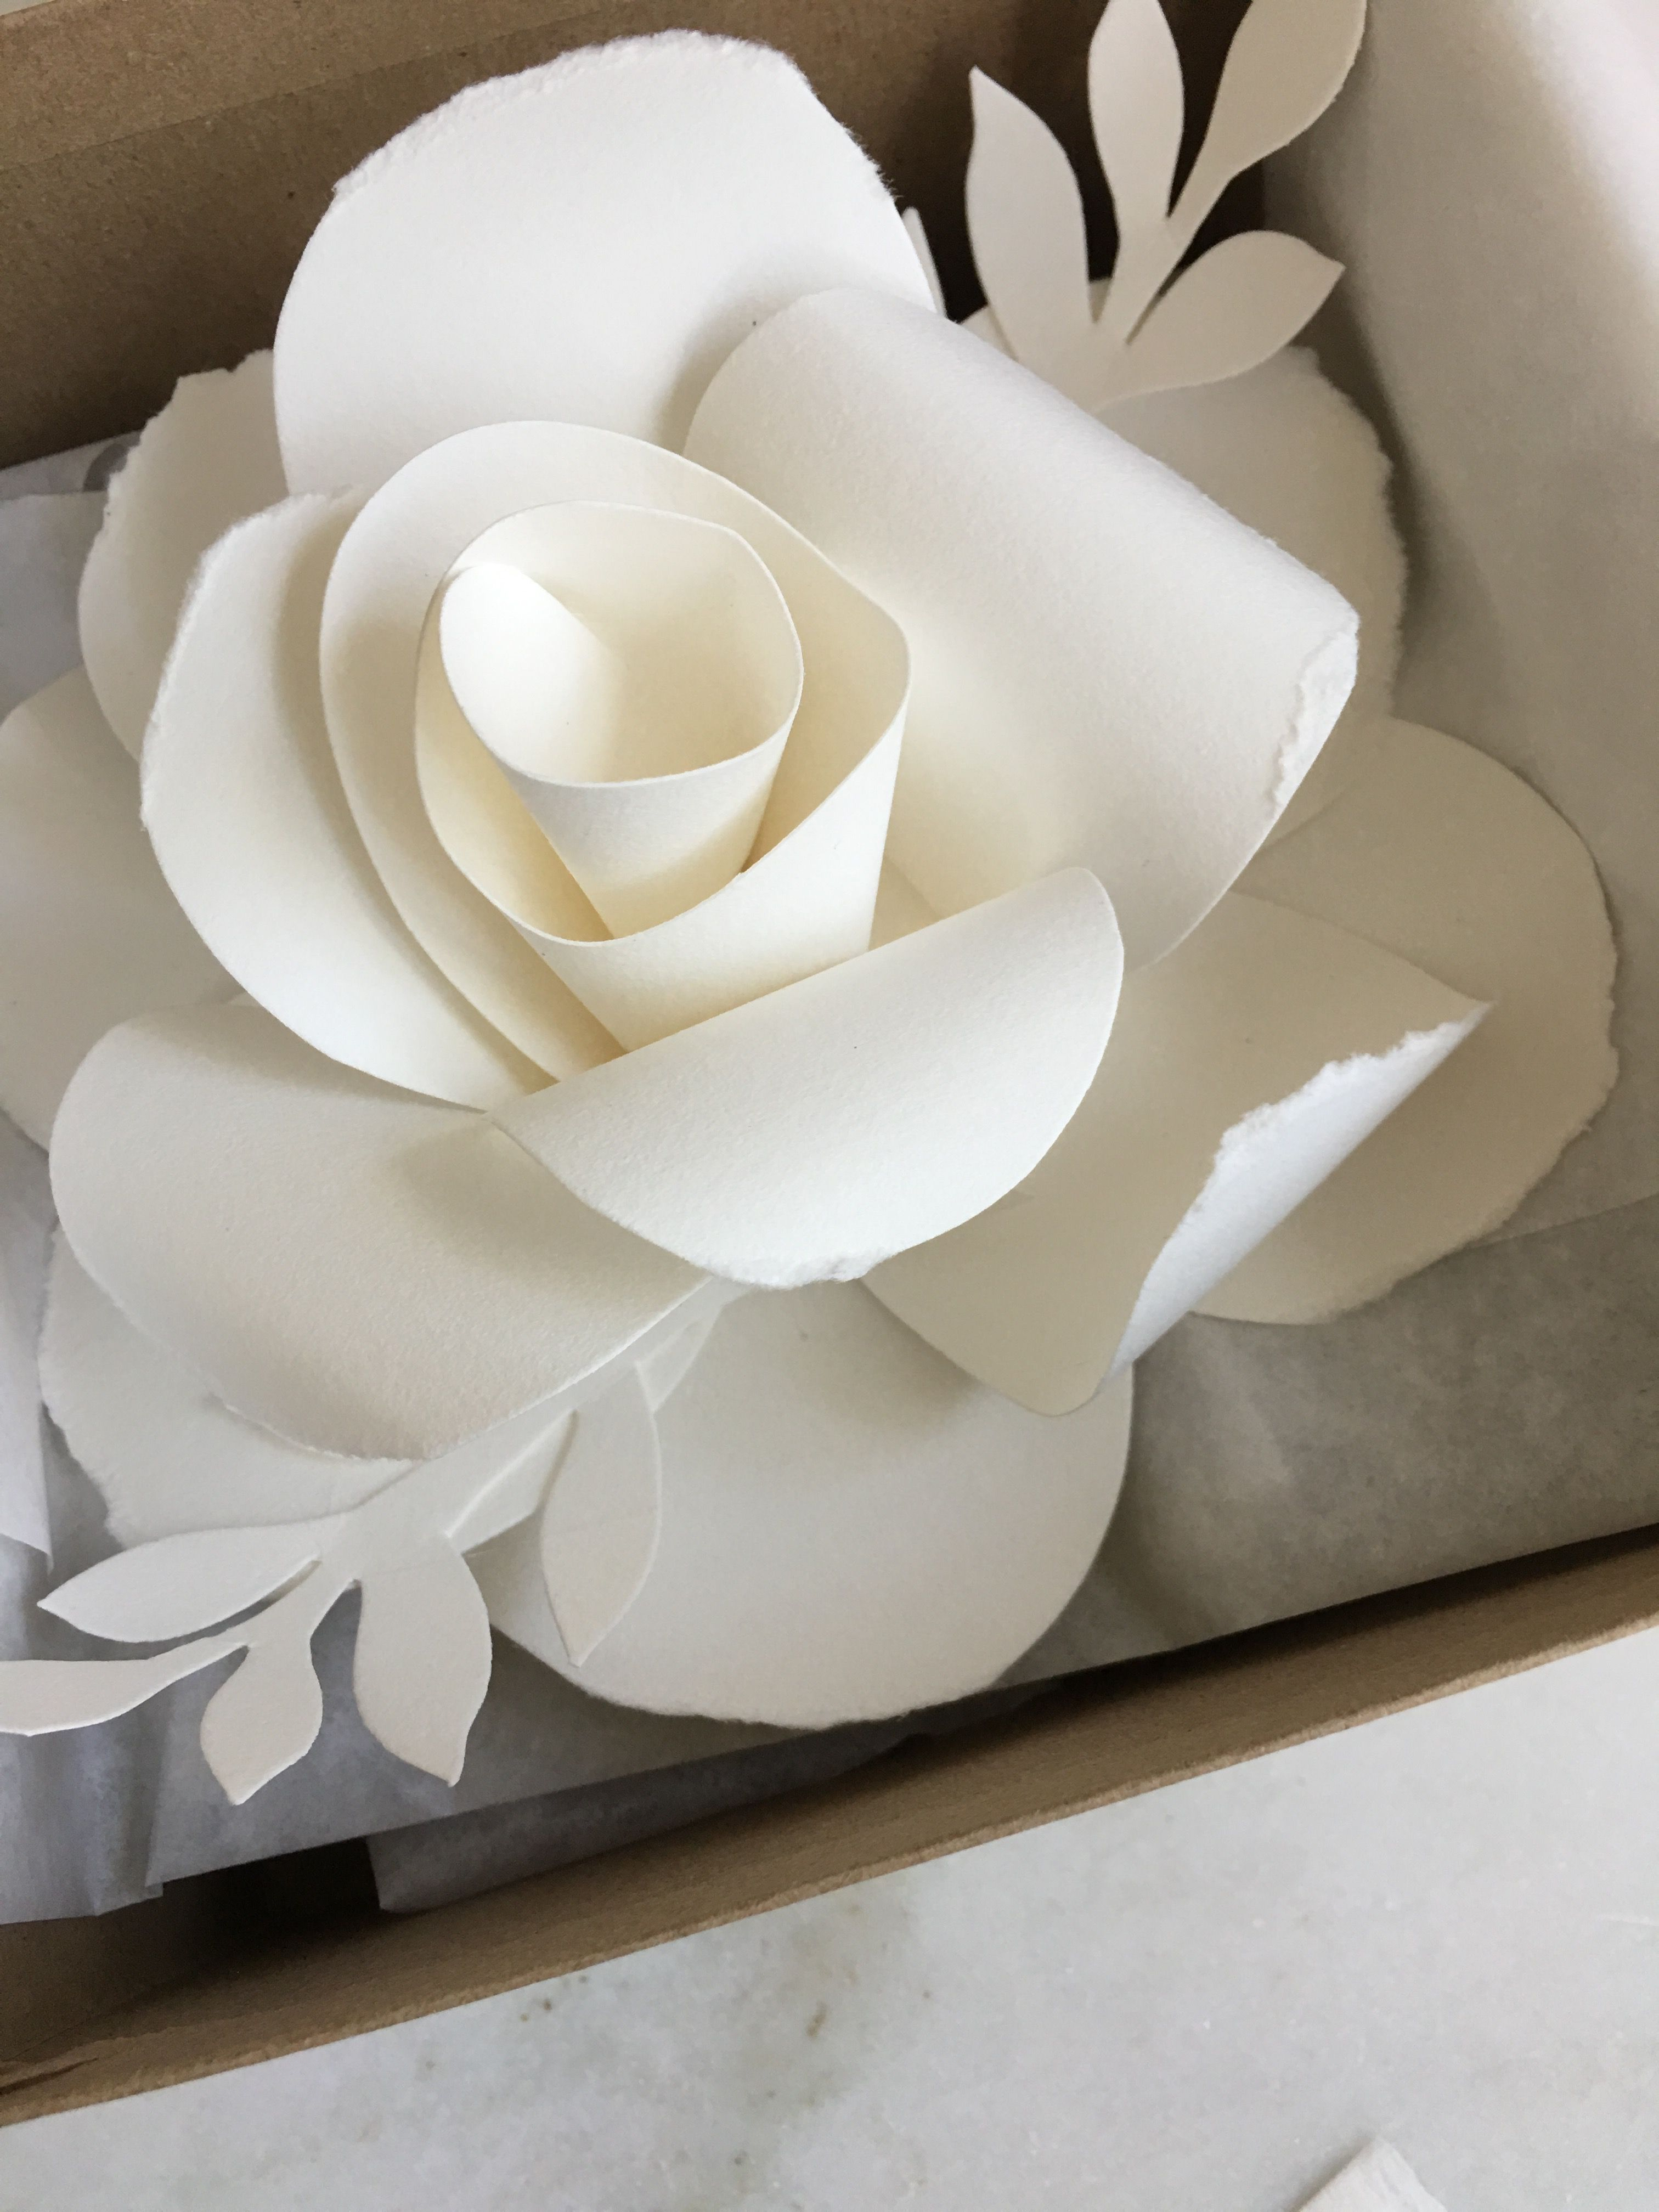 Rose Paper Sculpture Paper Flowers Artist French Paper Design